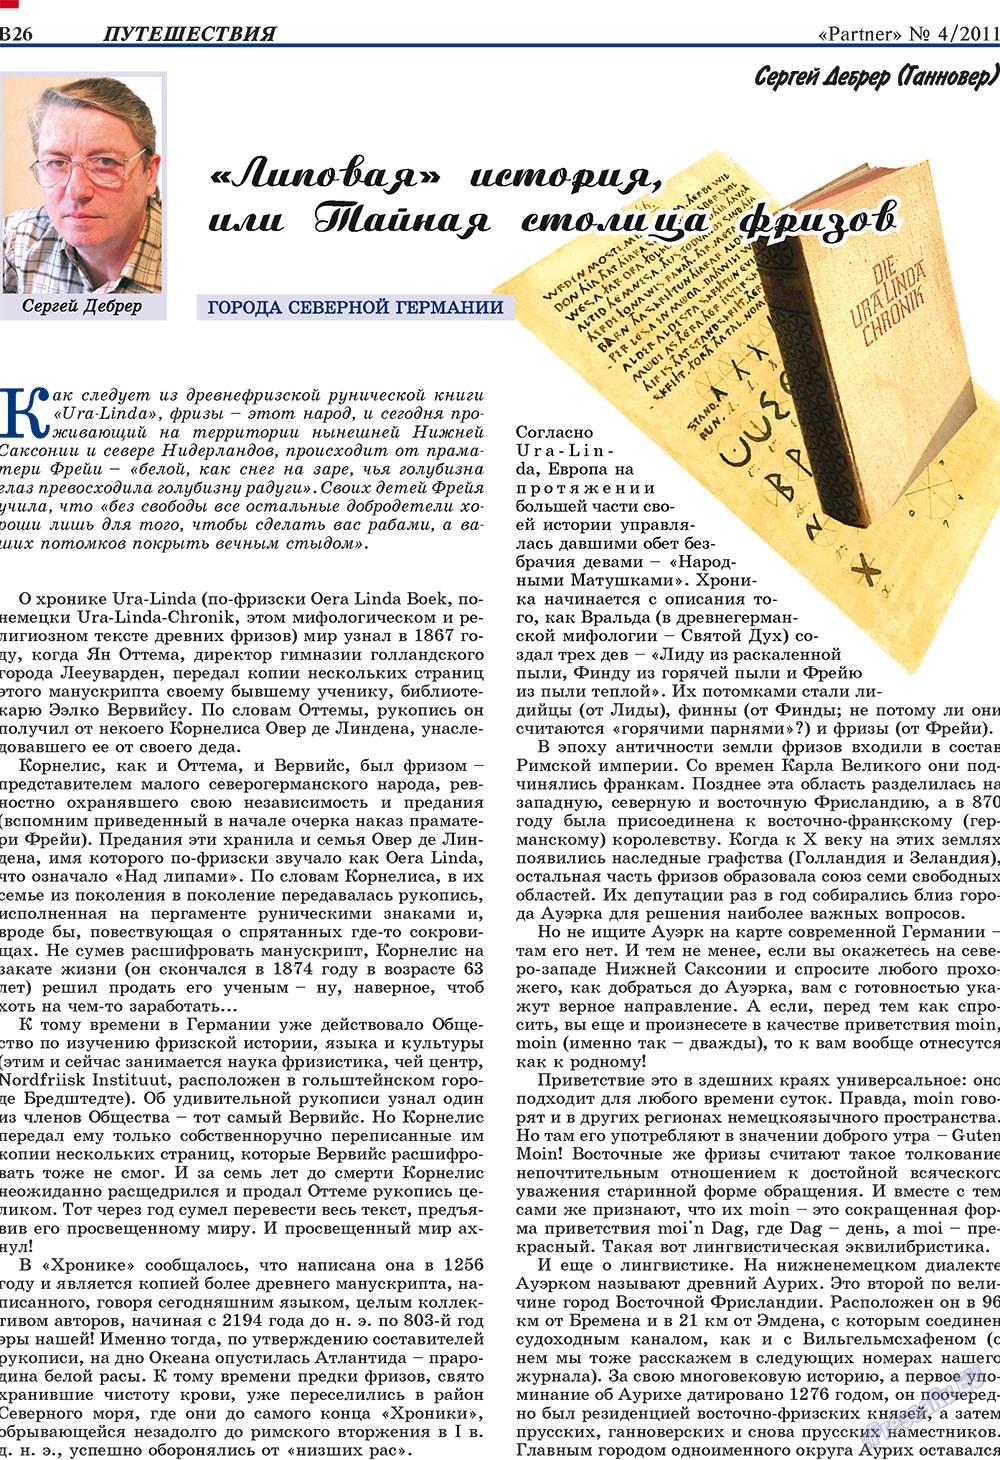 Партнер-север (журнал). 2011 год, номер 4, стр. 36